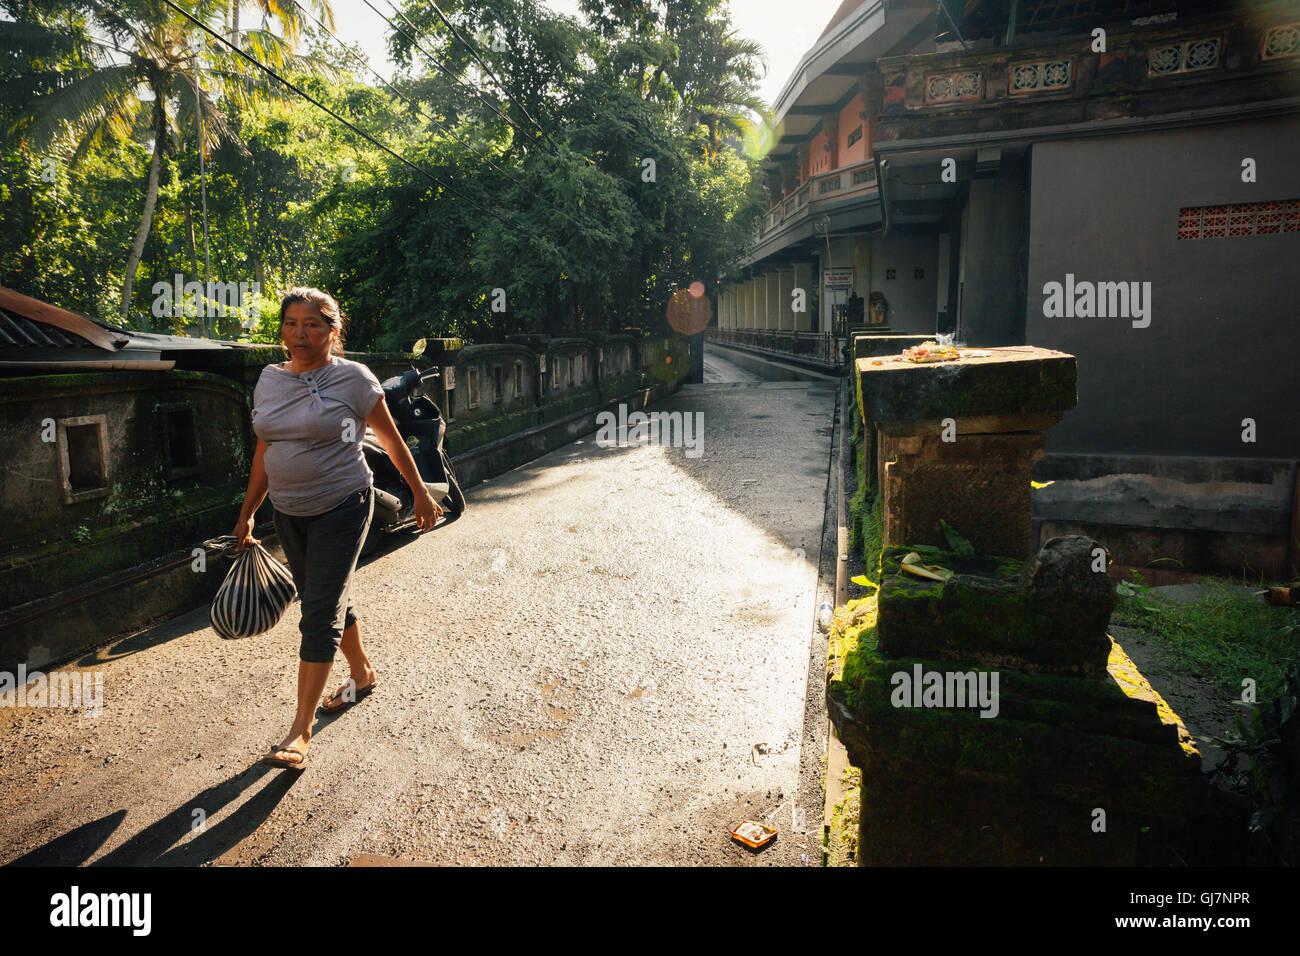 Ubud, Indonesia - February 28, 2016: Woman crossing old stone bridge in the morning hour, Ubud, Bali, Indonesia. - Stock Image